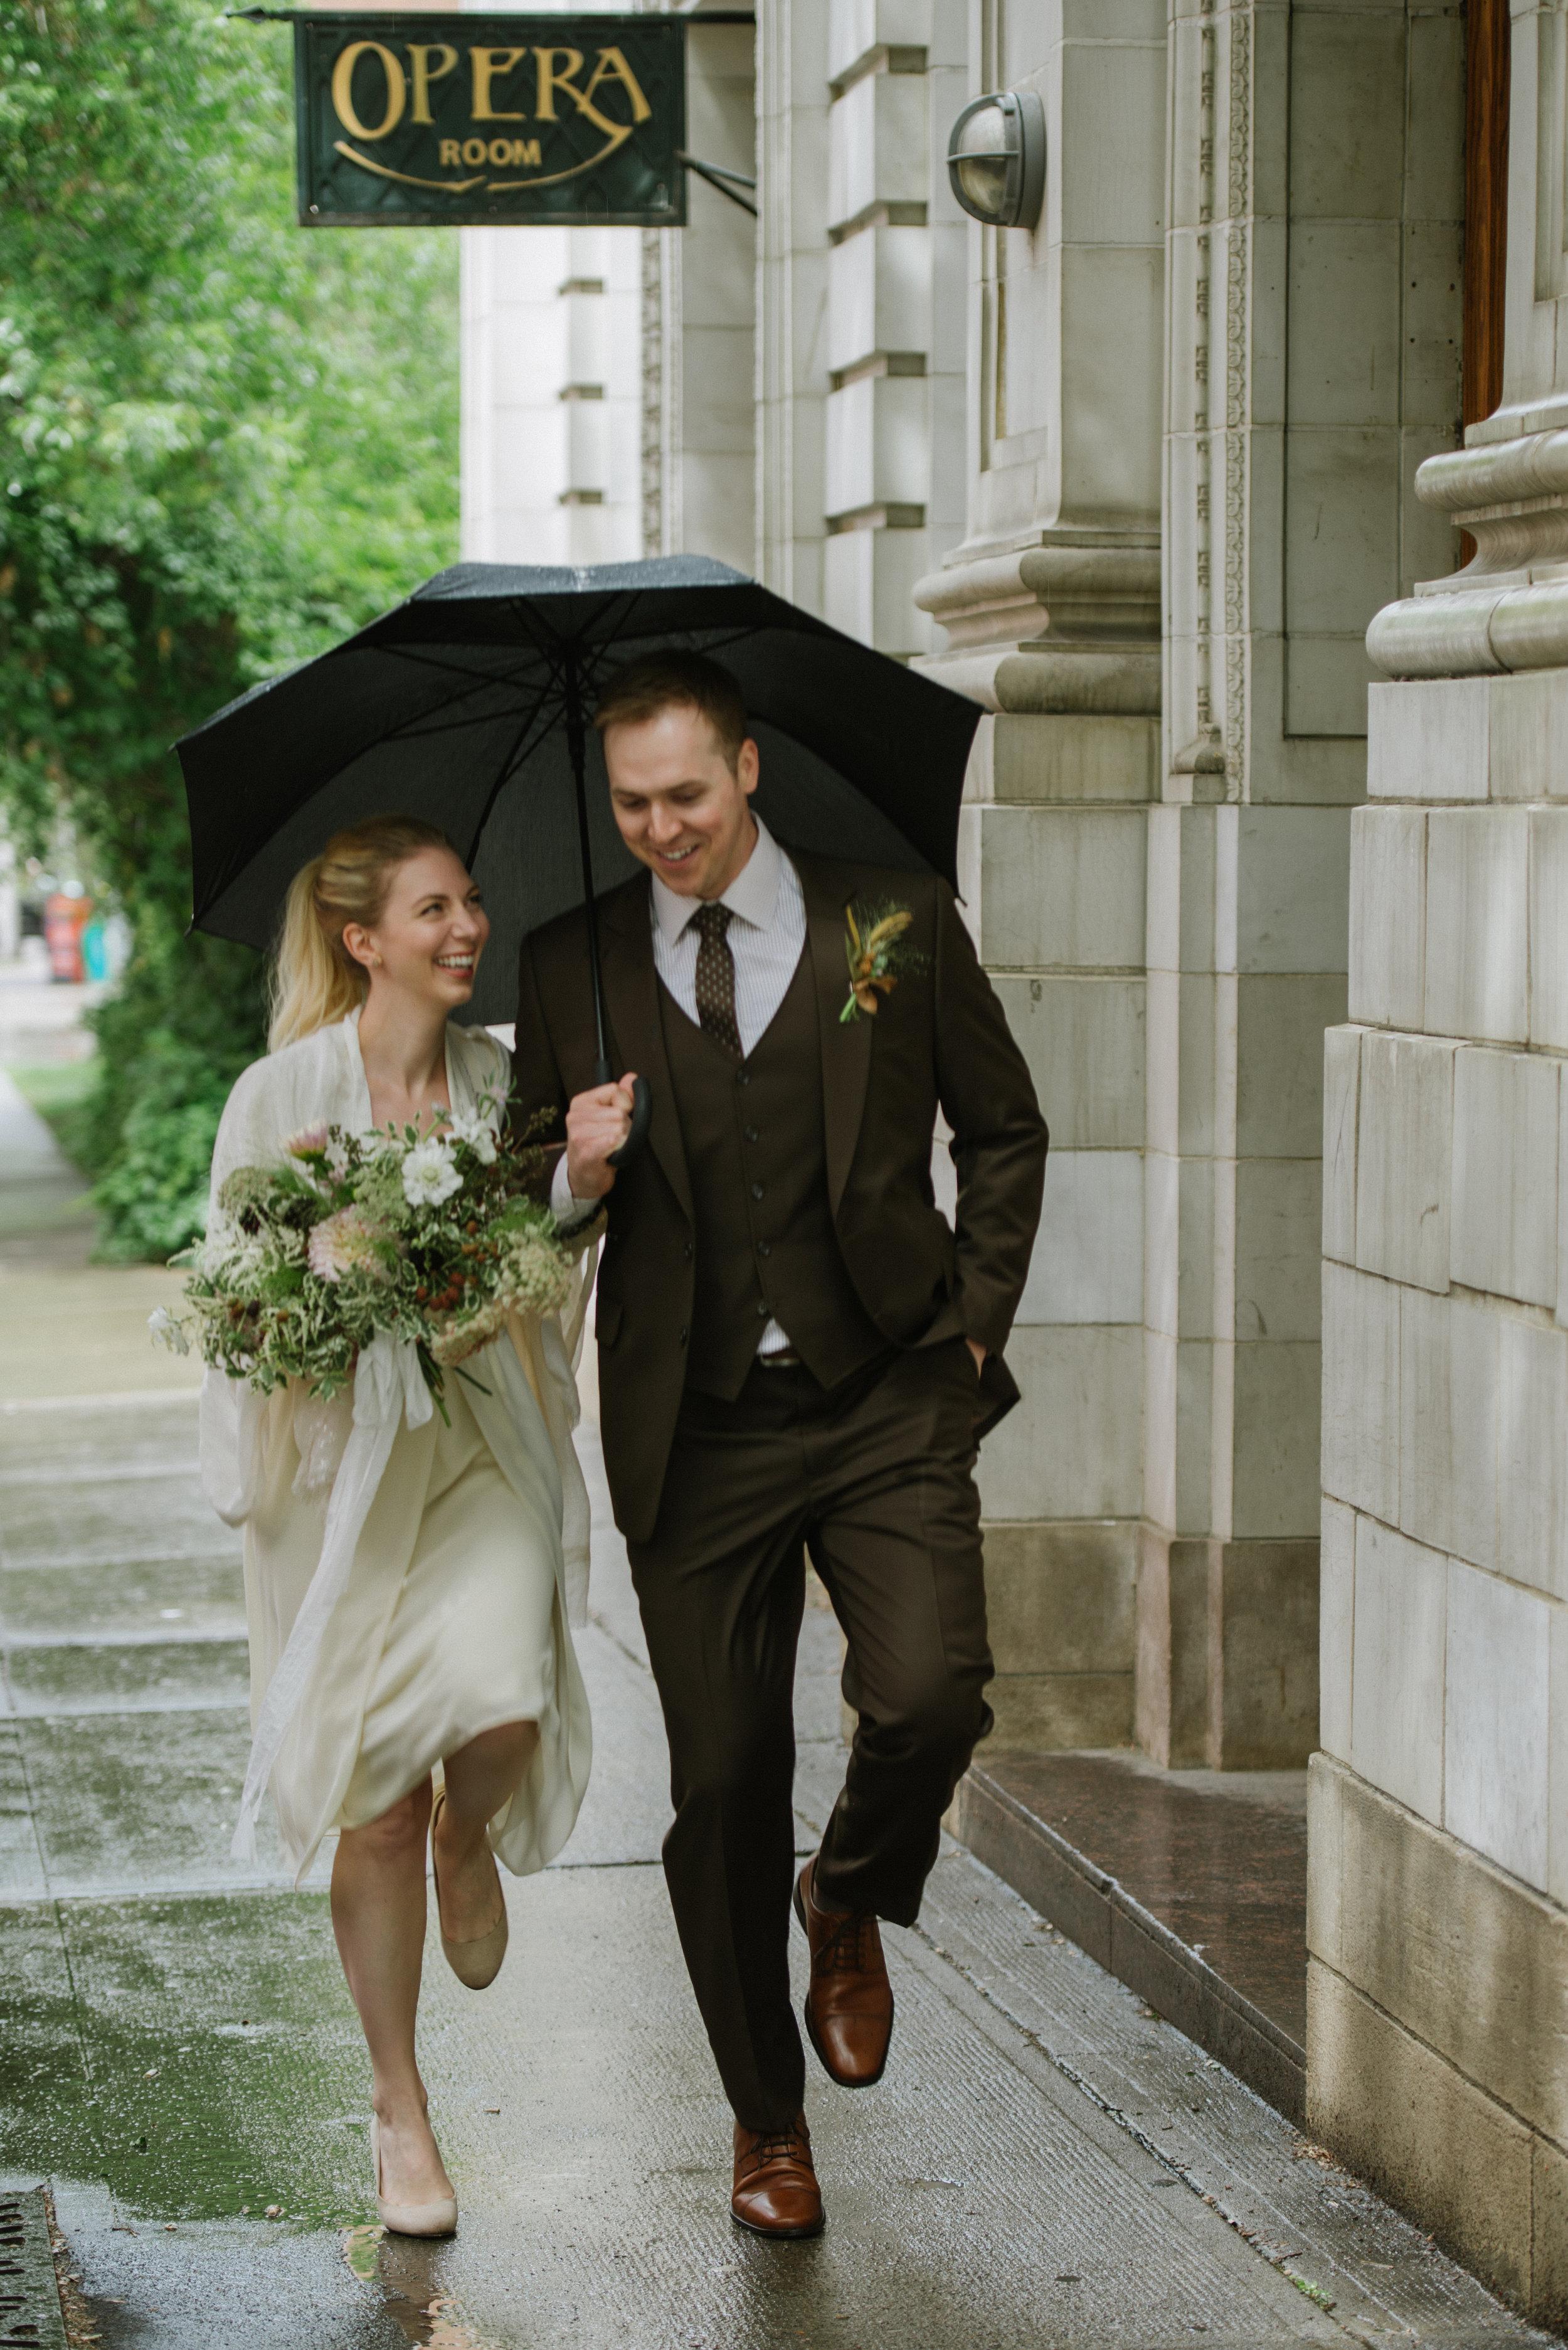 Teatro_Wedding_Calgary_Wedding_Photography_Vanessa_Tom_Married_2018_HR011.jpg